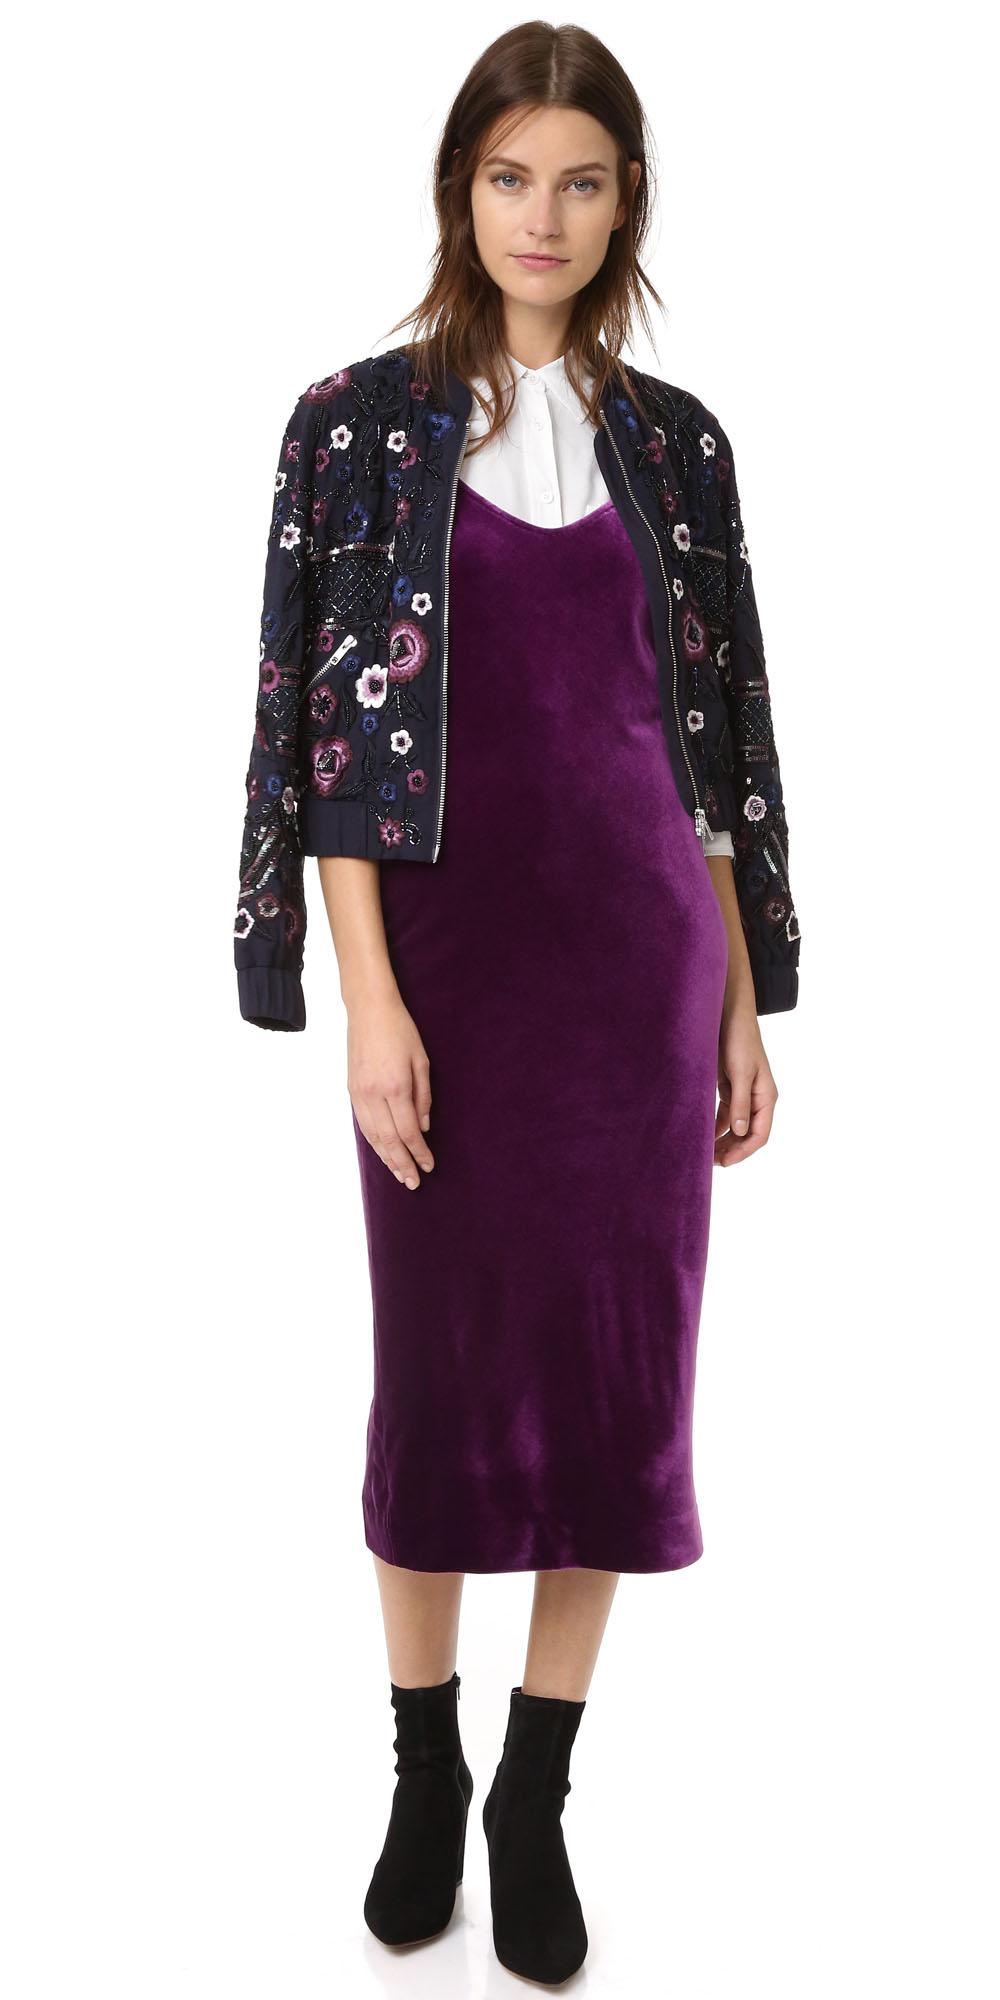 purple-royal-dress-slip-white-collared-shirt-black-jacket-bomber-black-shoe-booties-howtowear-fall-winter-hairr-lunch.jpg